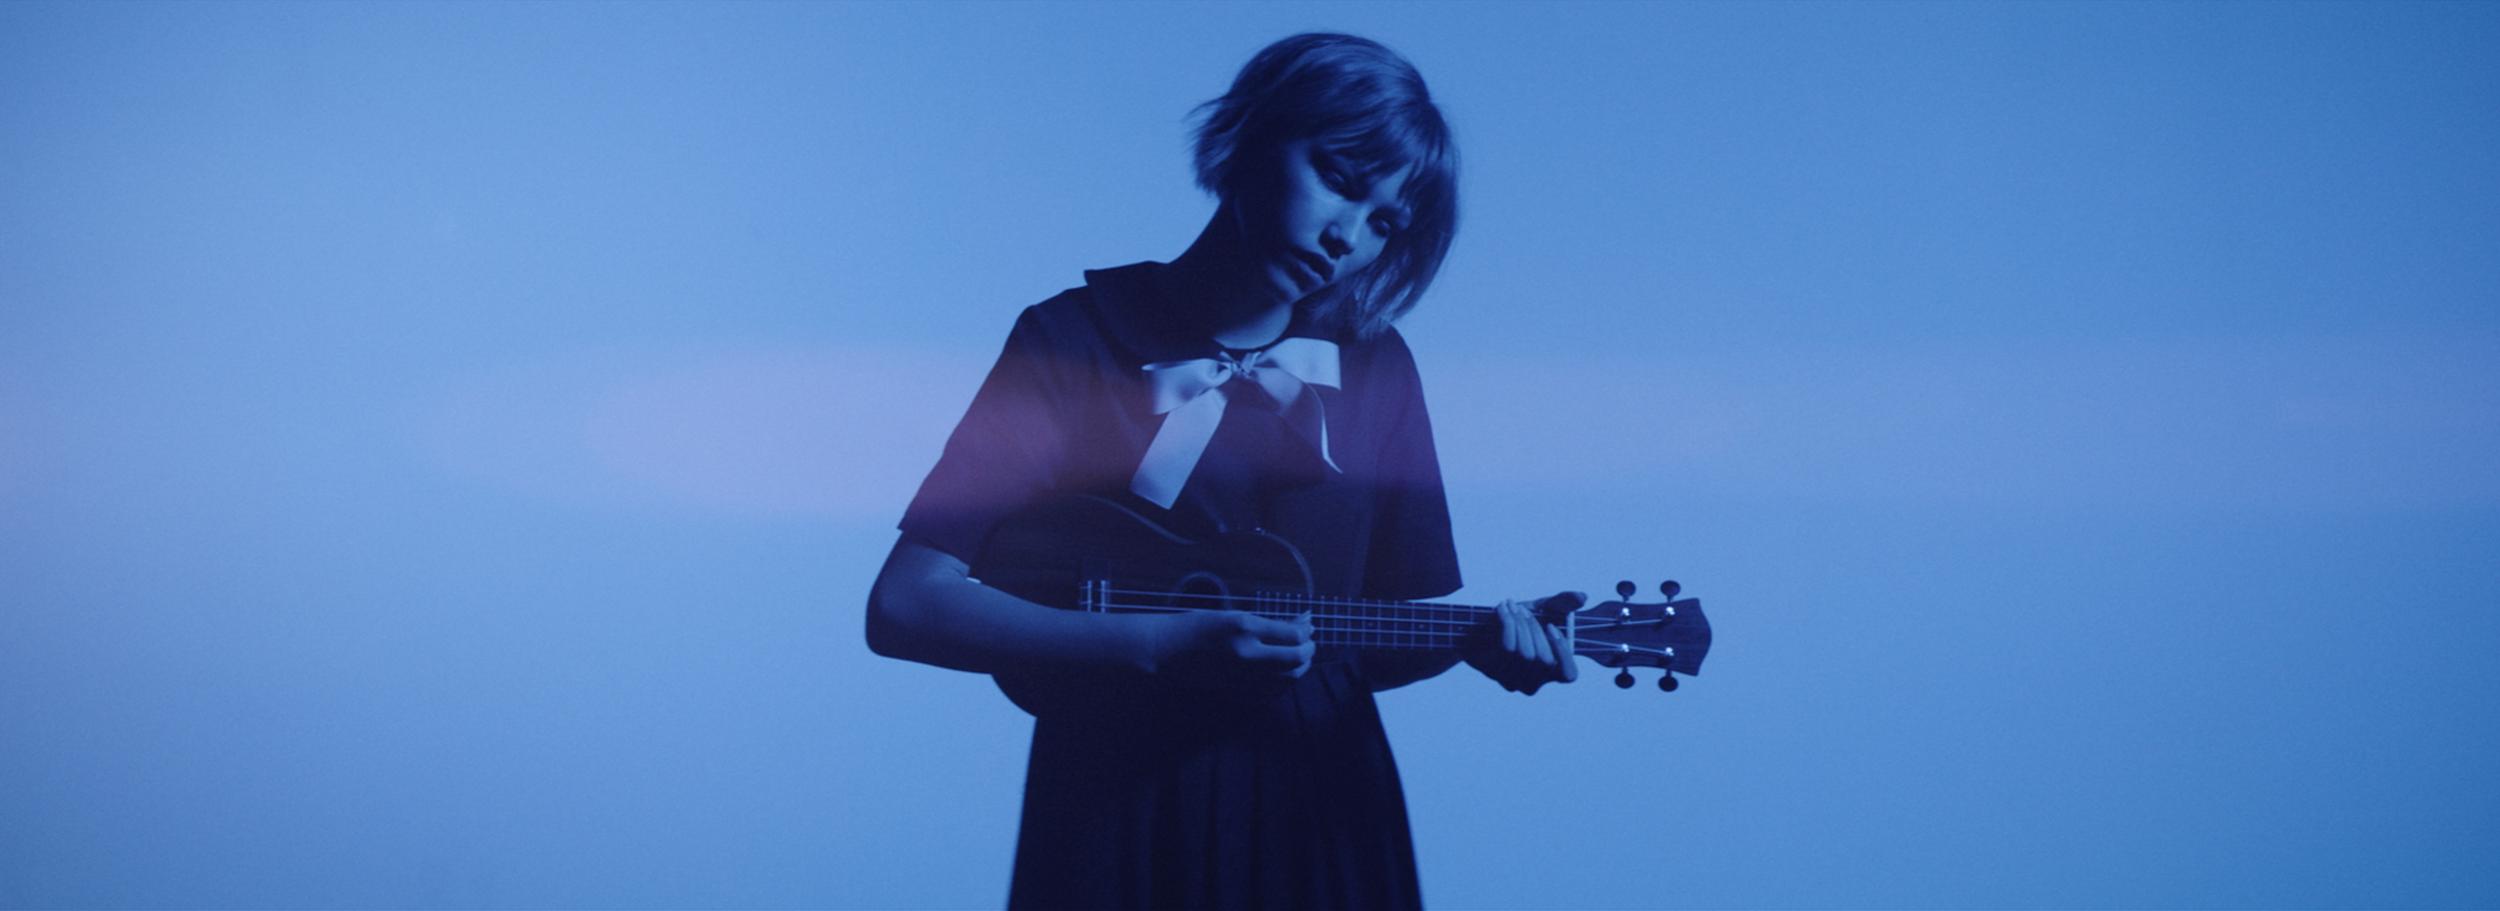 Moonlight-GraceVanderWaal_COLOR-MASTER-01_mov 7.png